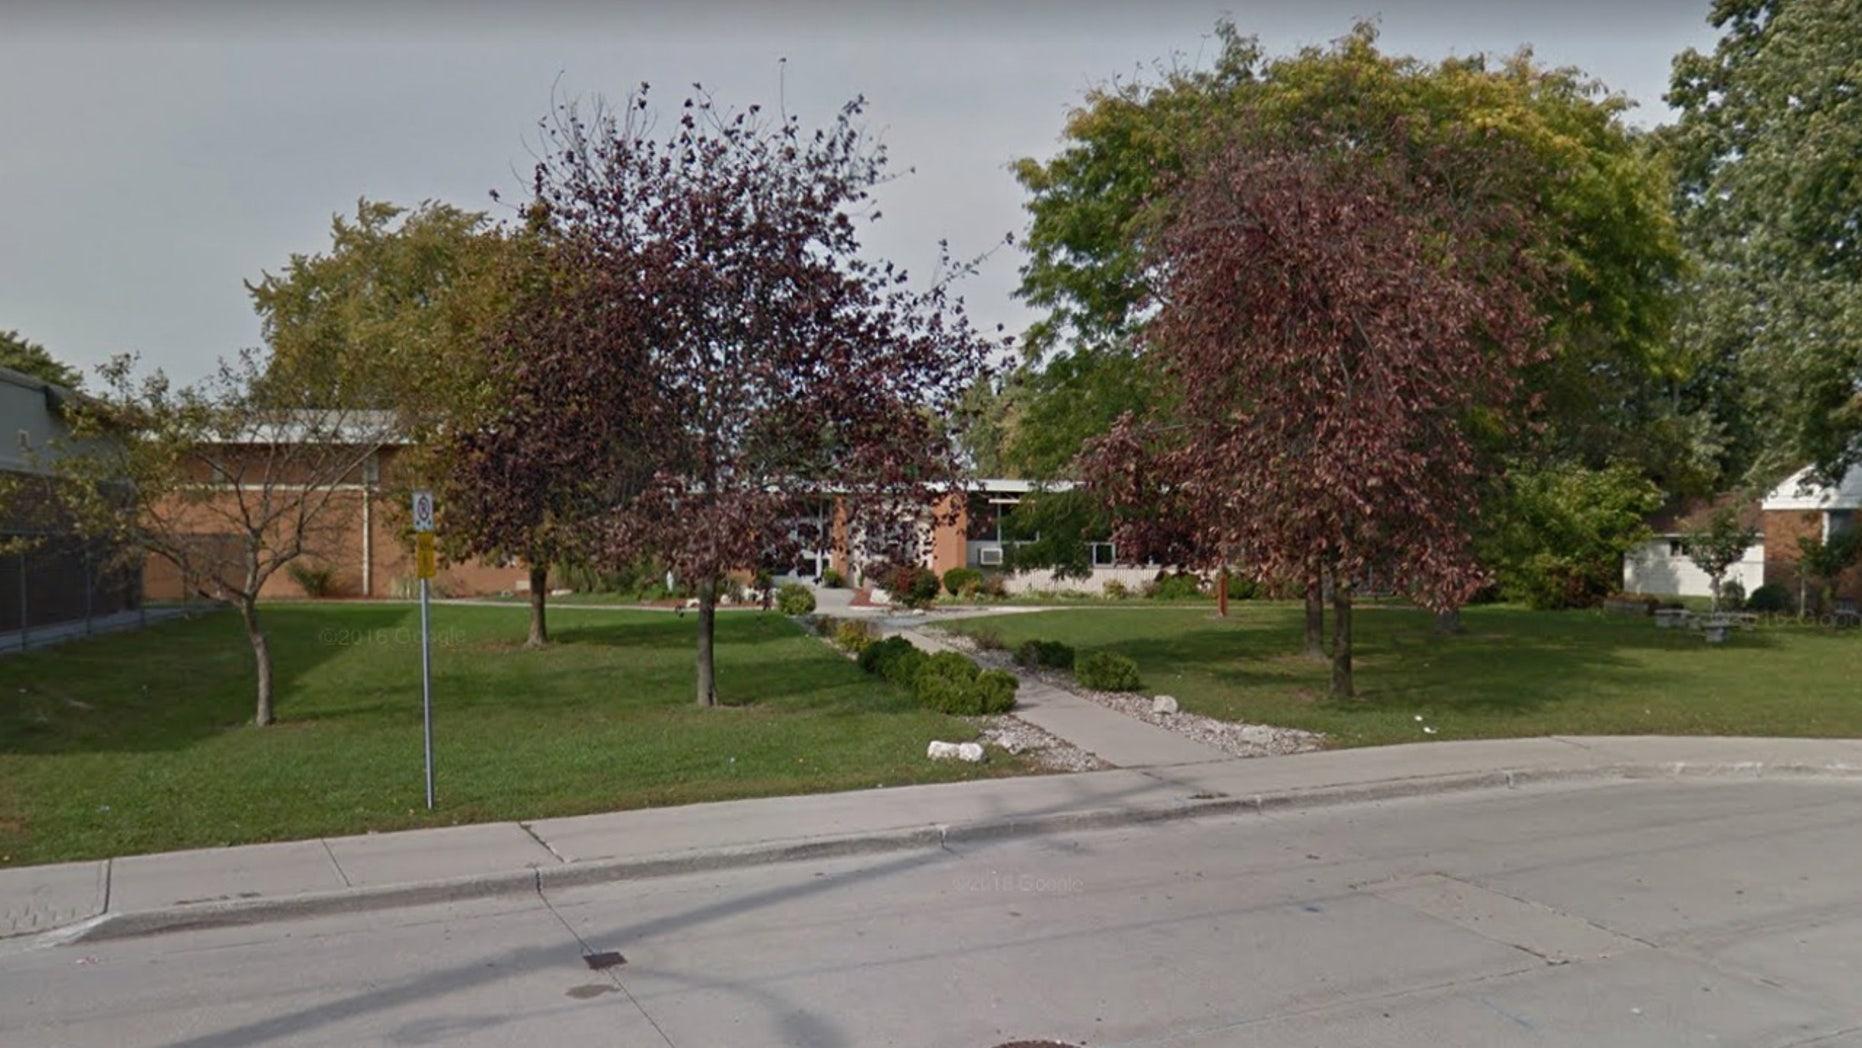 King Catholic Elementary School in Windsor, Ontario.